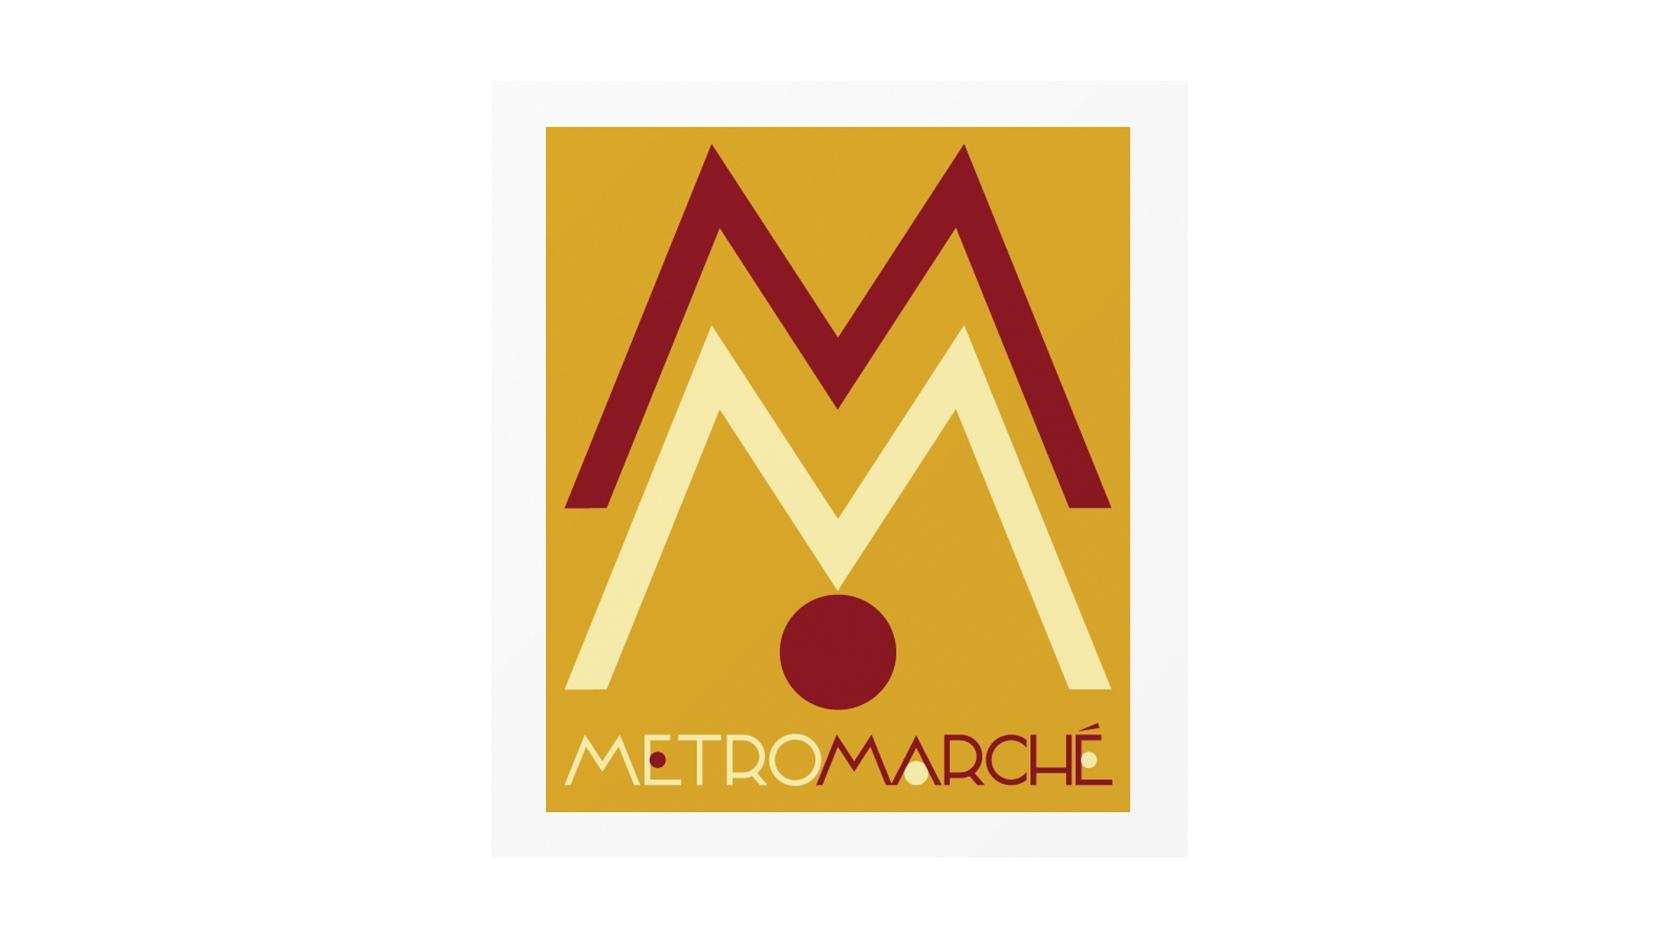 MetroMarcheLogo.jpg